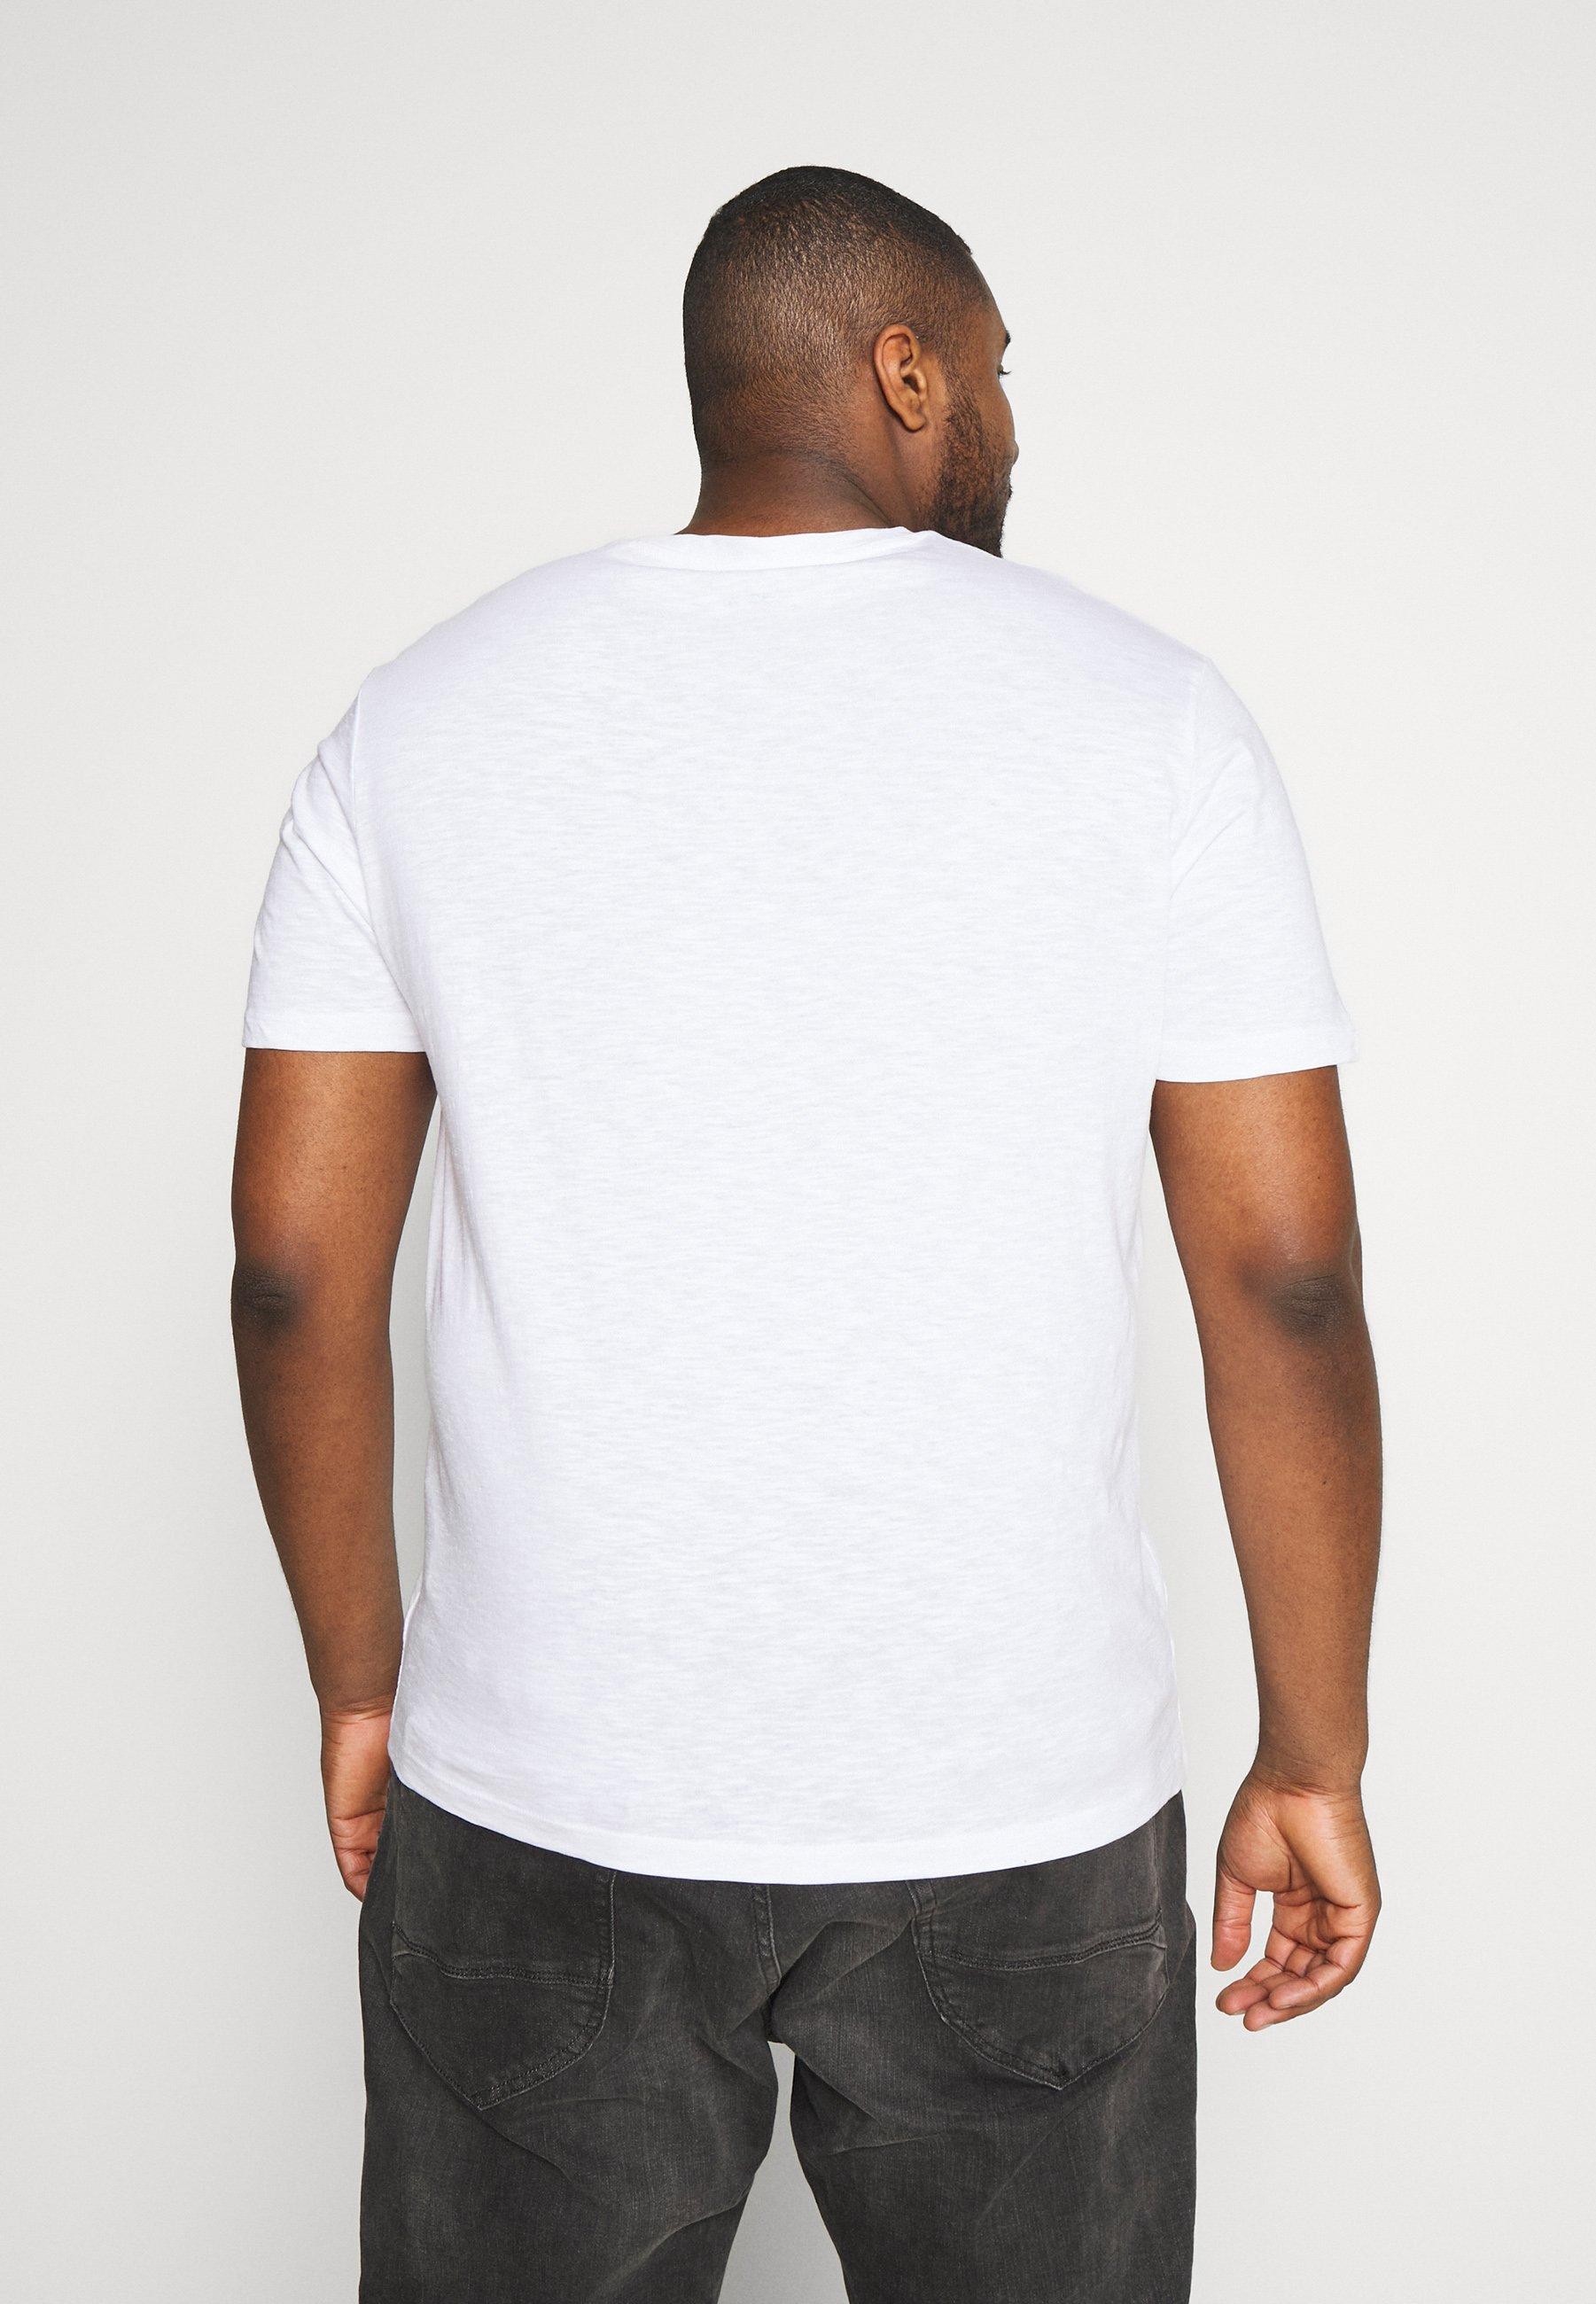 Tom Tailor Men Plus Slub With Print - T-shirt Con Stampa White FY15a